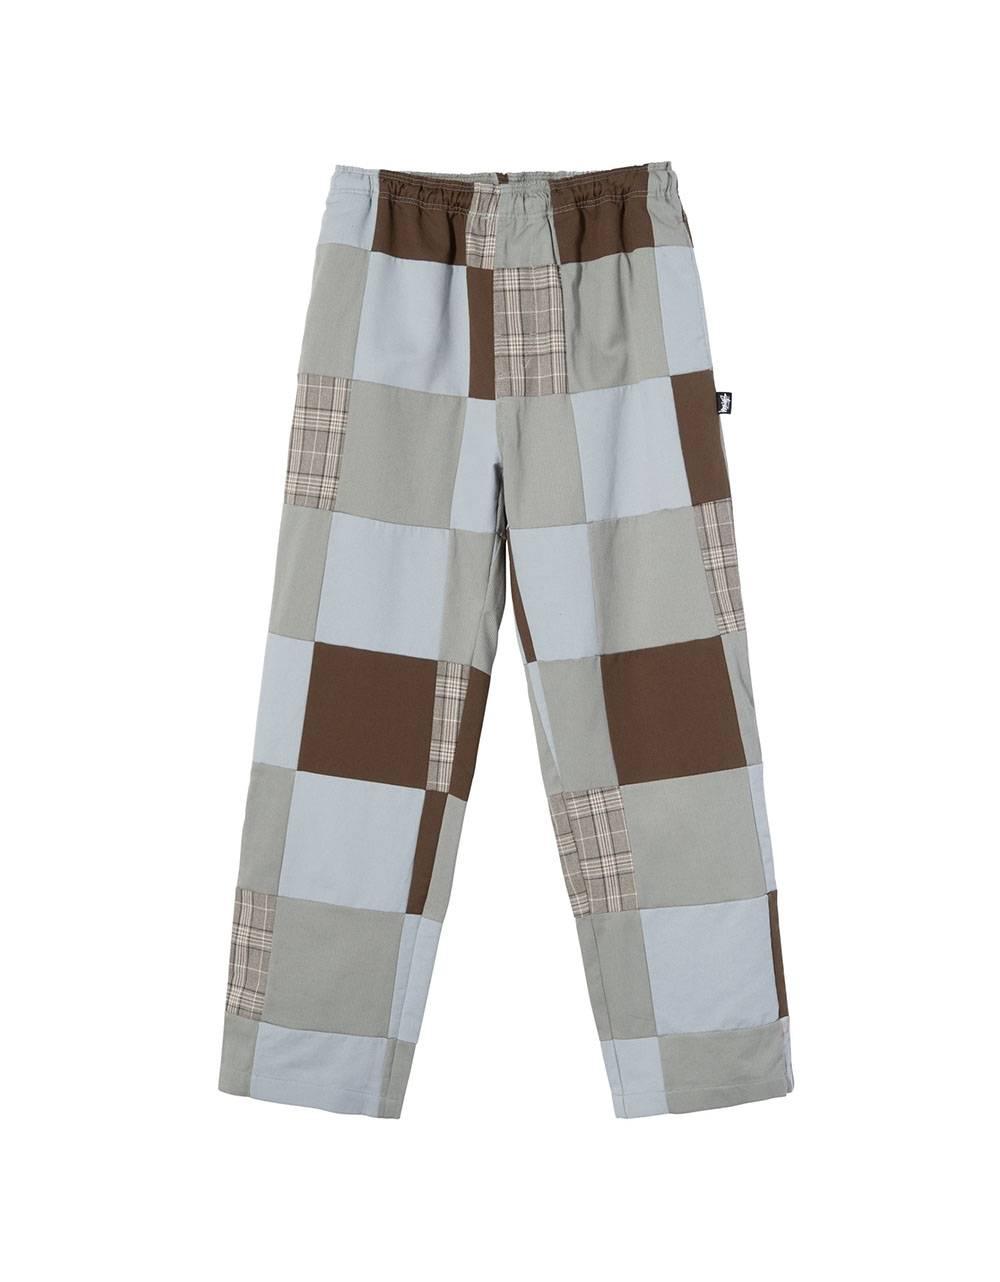 Stussy patchwork beach pants - multi Stussy Pant 165,00€